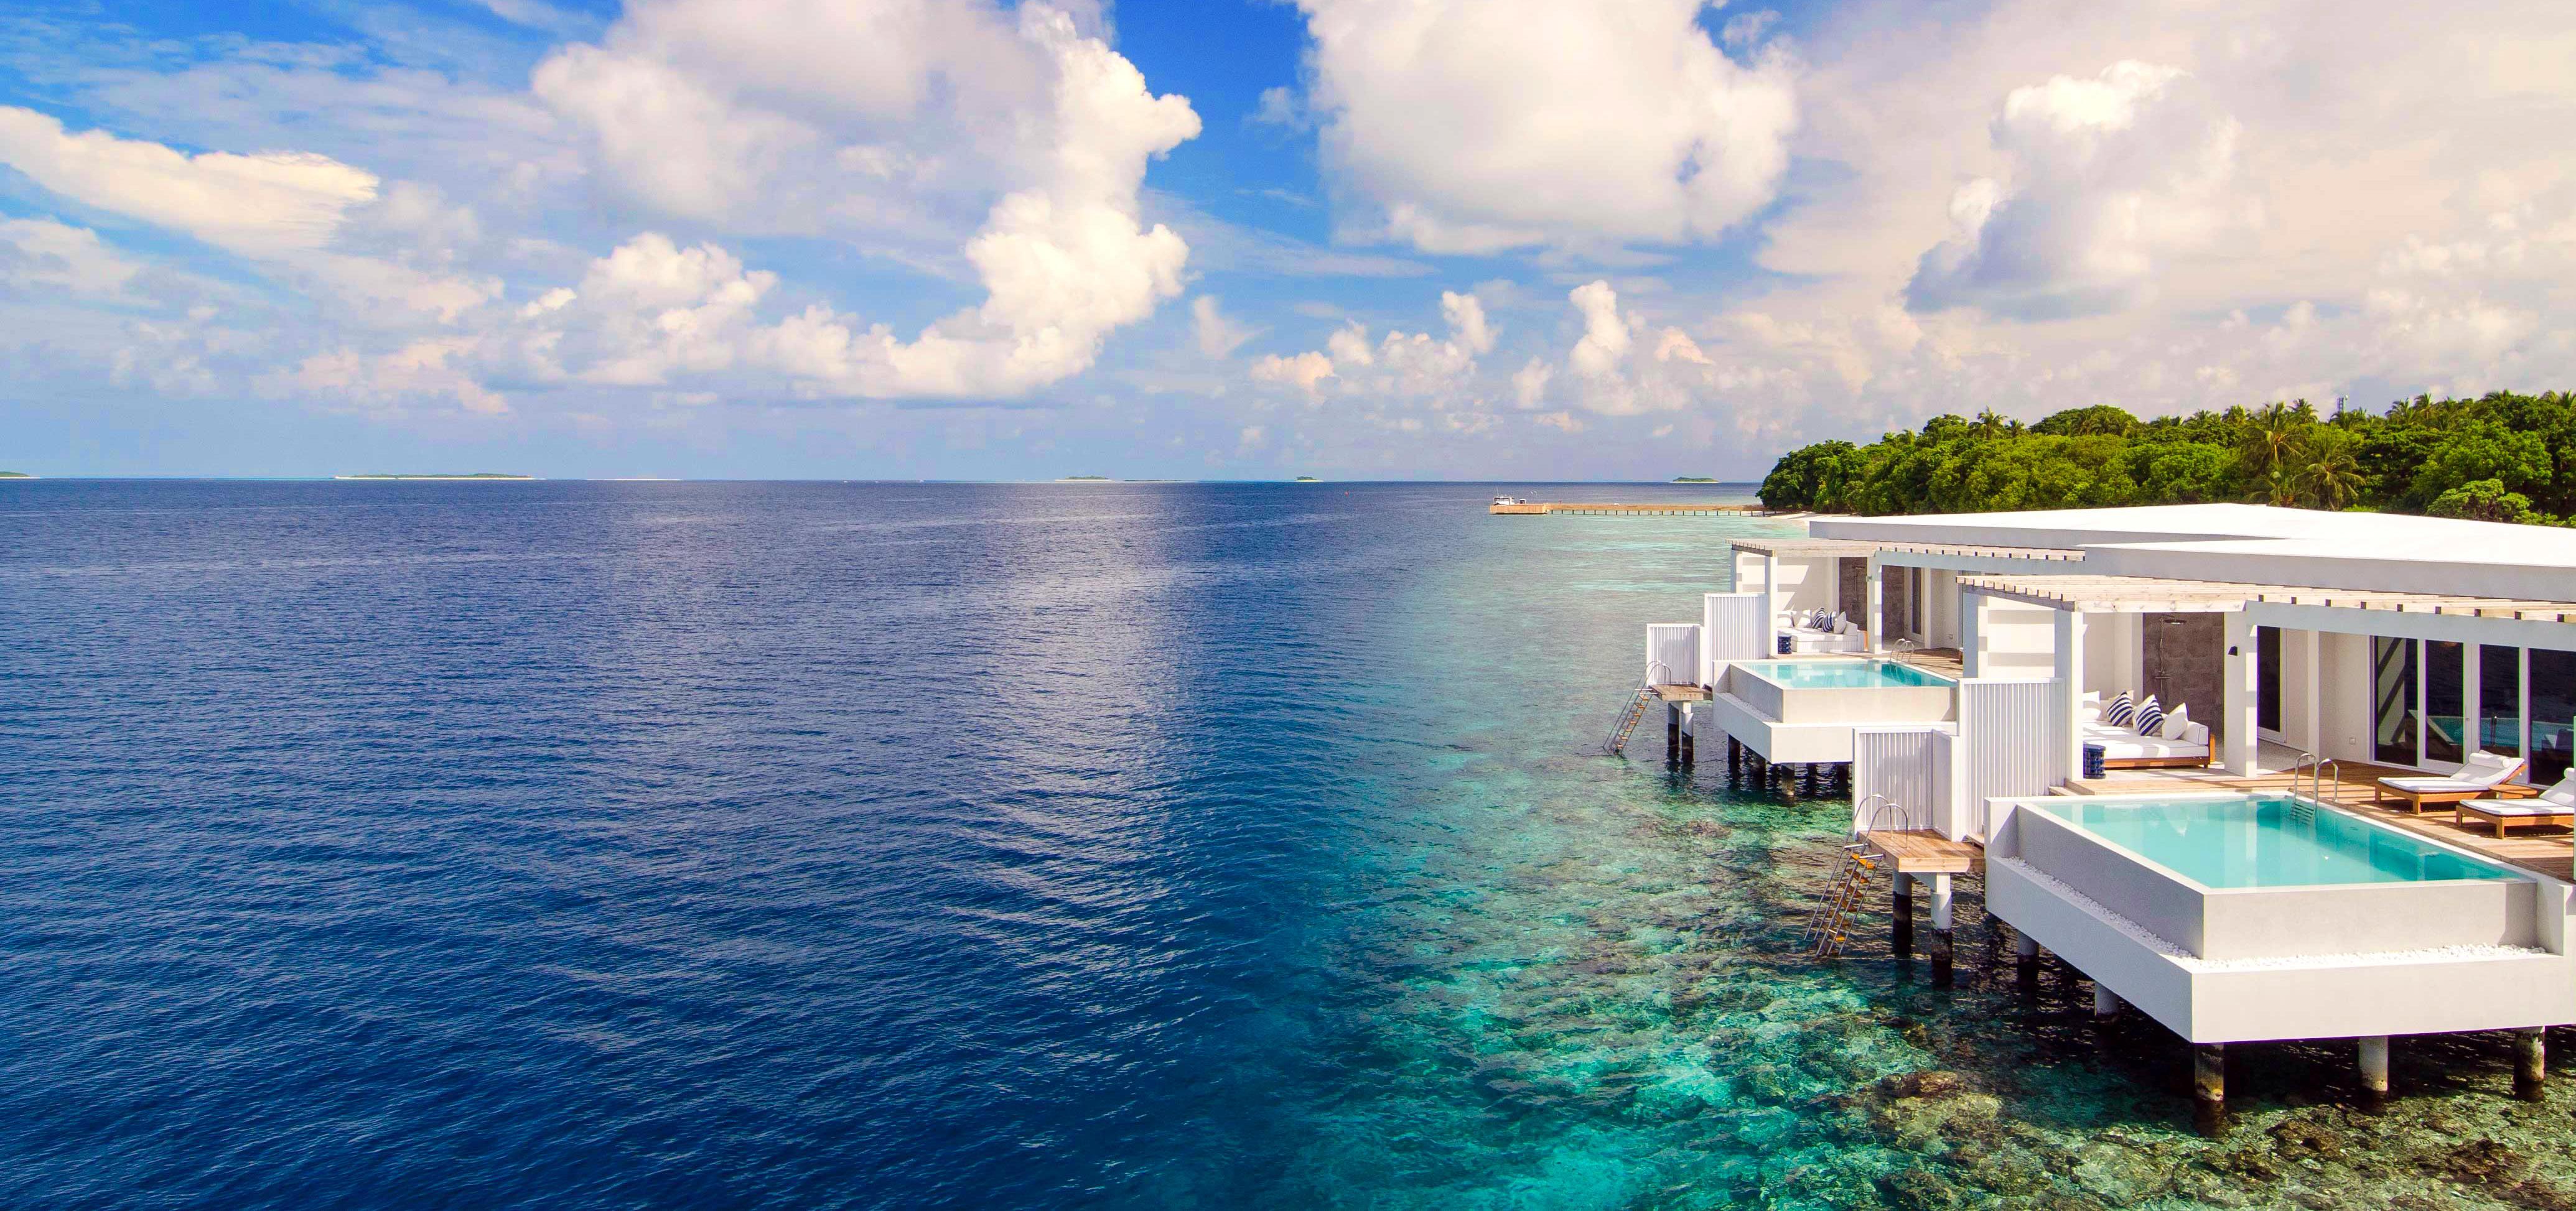 Обои море, остров, тропики, курорт